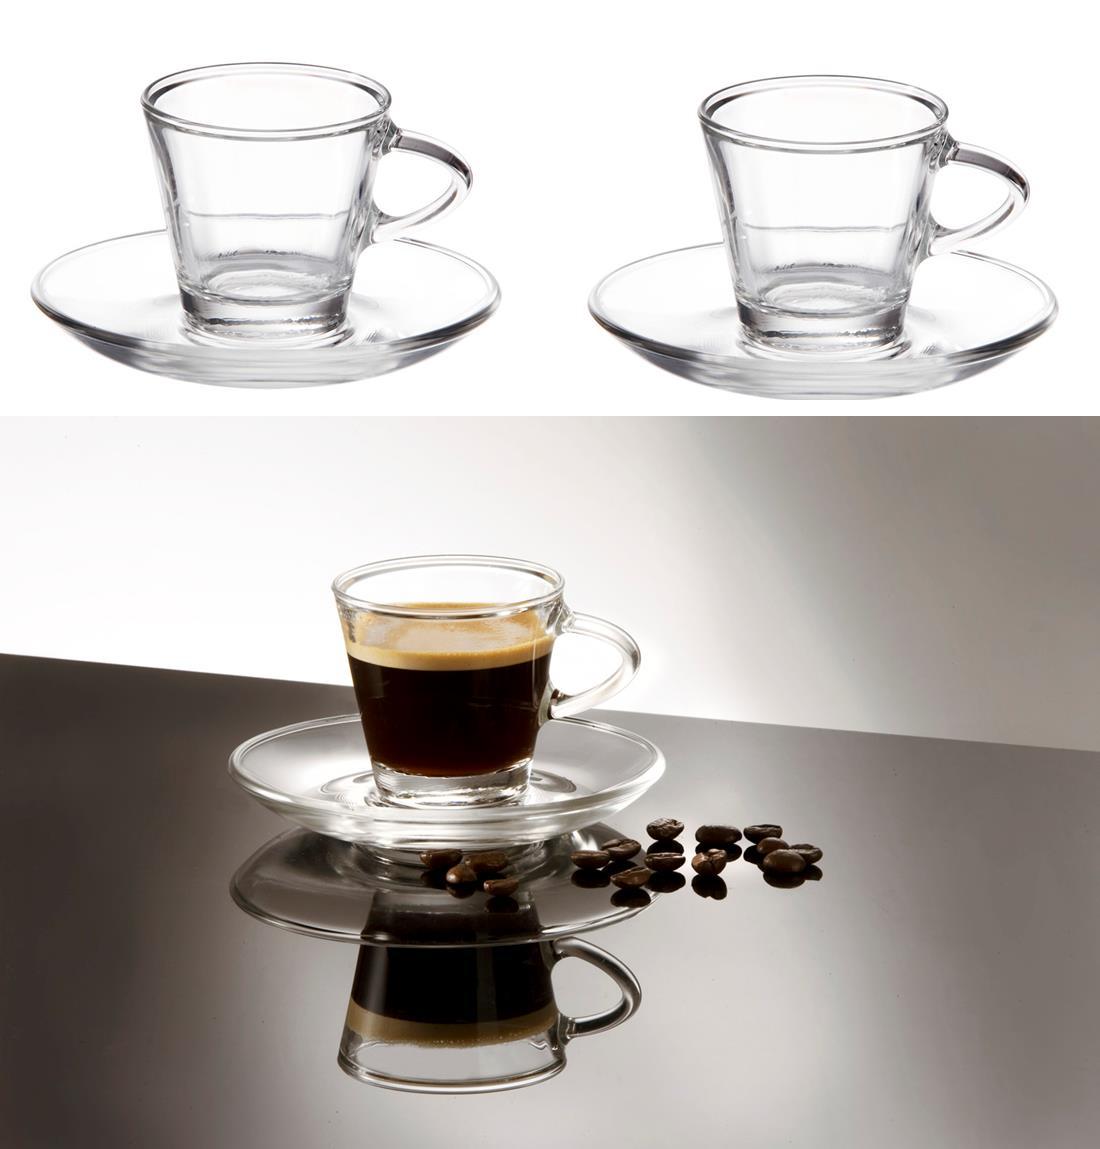 Glass espresso coffee cups uk - 2 Clear Small Glass Espresso Coffee Cups Saucers 80ml Set Of 2 Gift Boxed